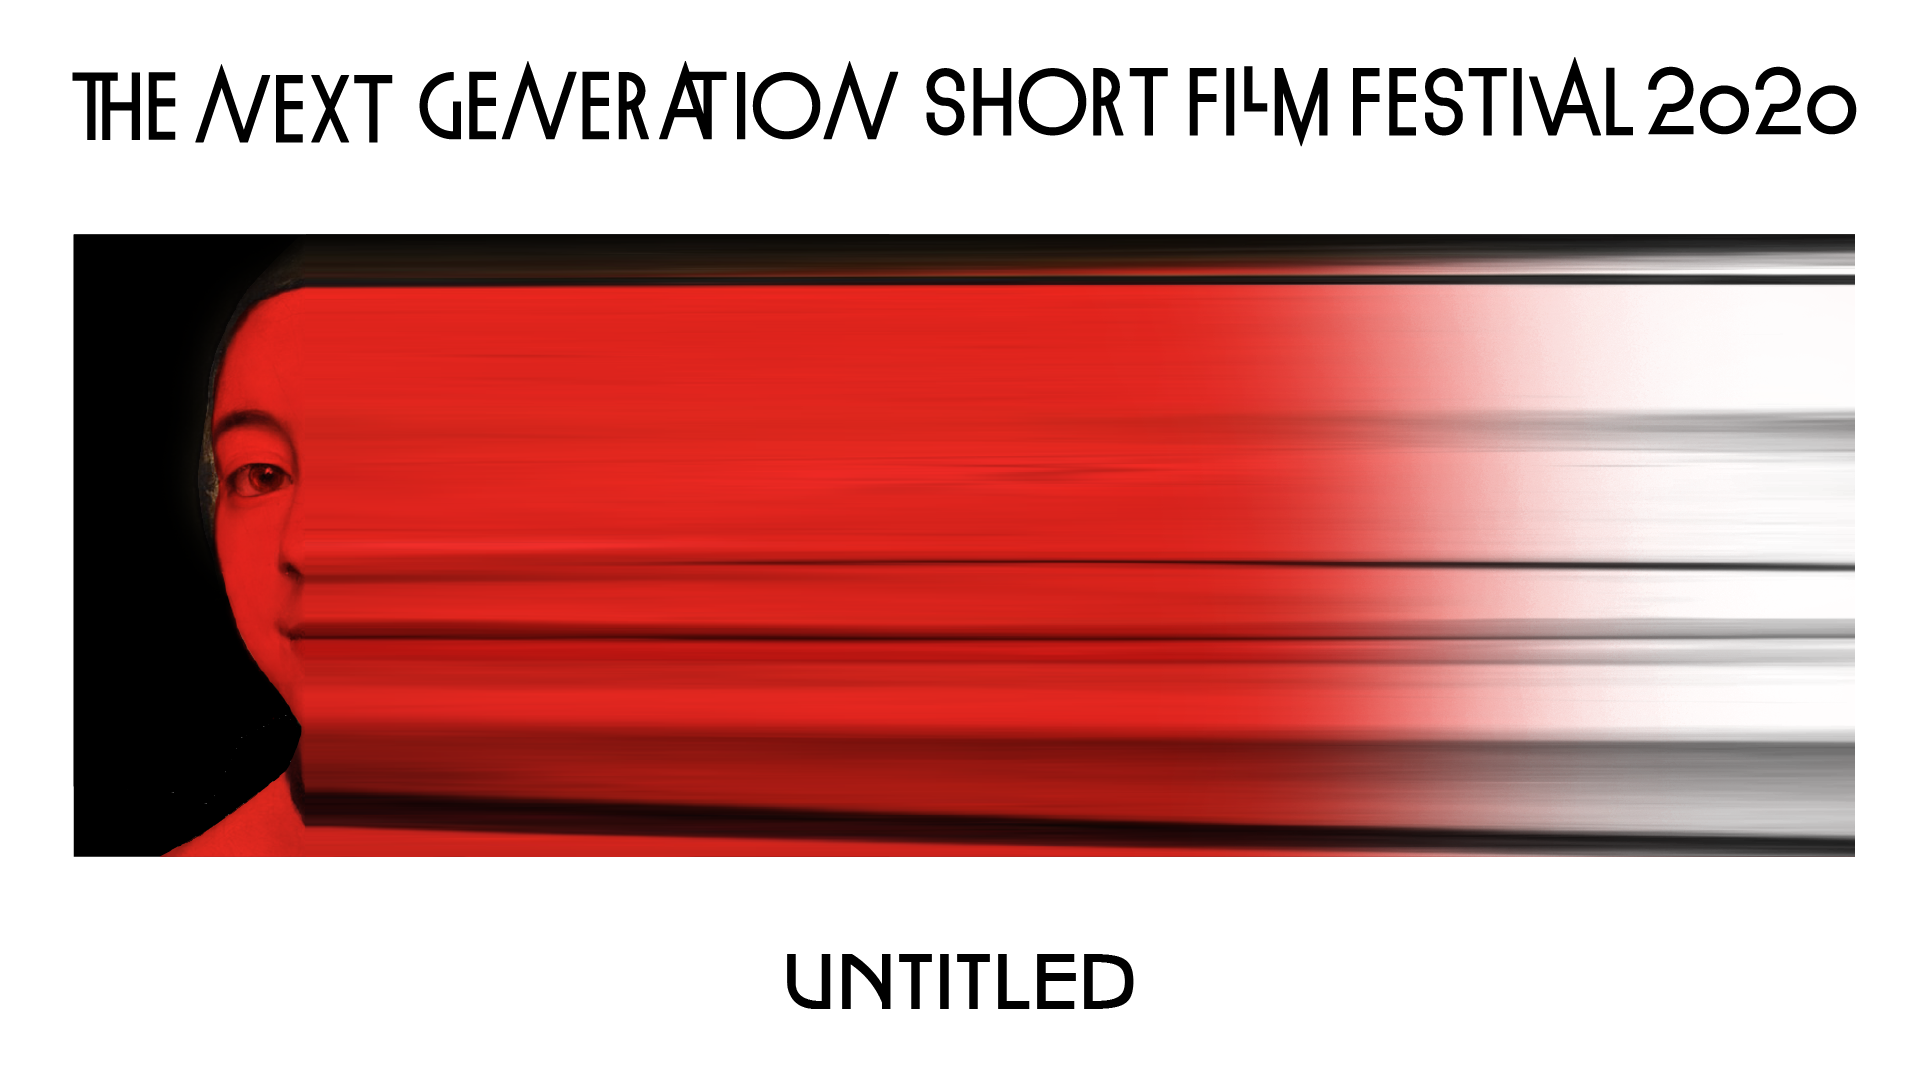 UNTITLED the next generation short film festival 2020